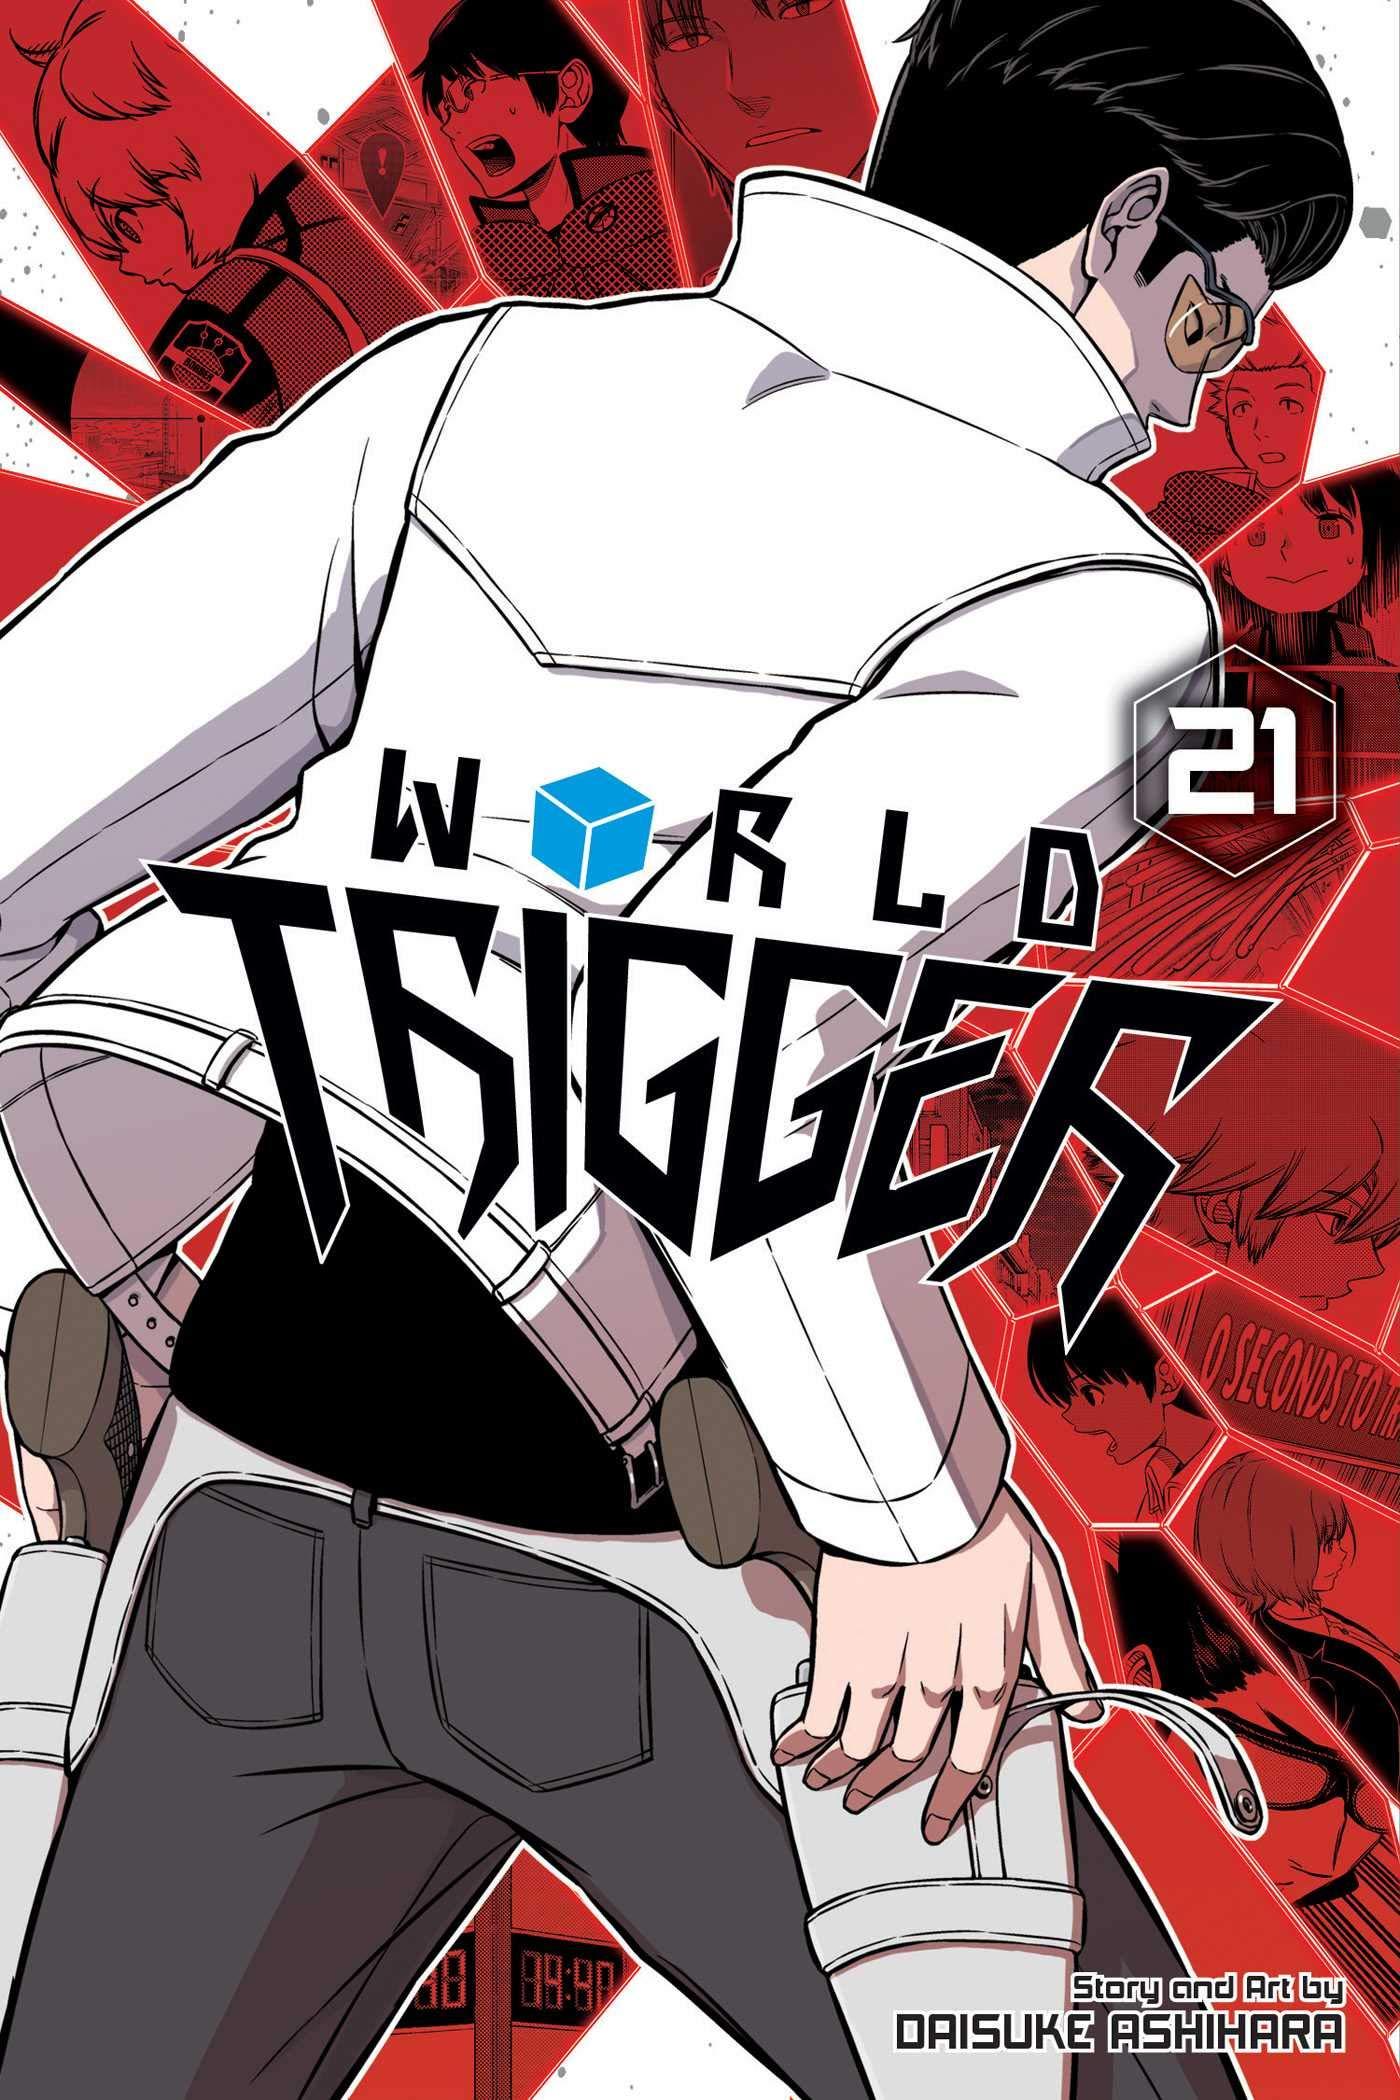 World Trigger - Volume 21